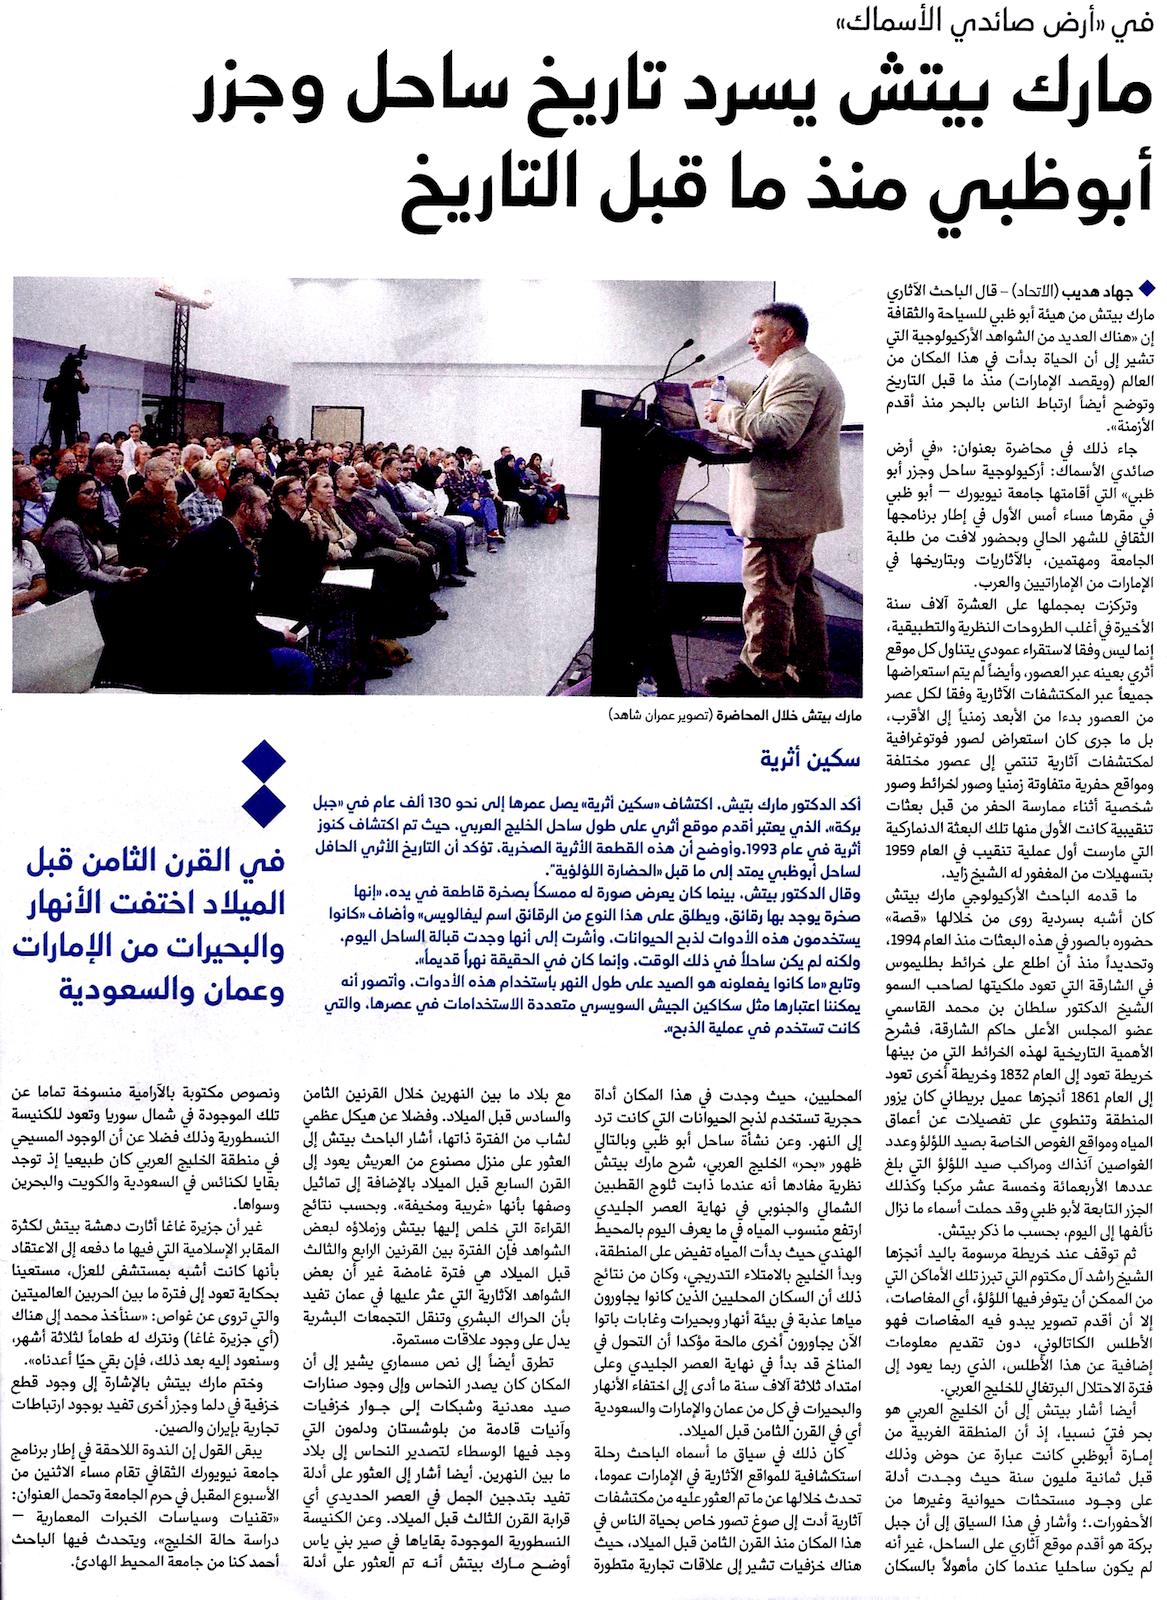 Al Ittihad (arabic) 7 February 2014, page 19